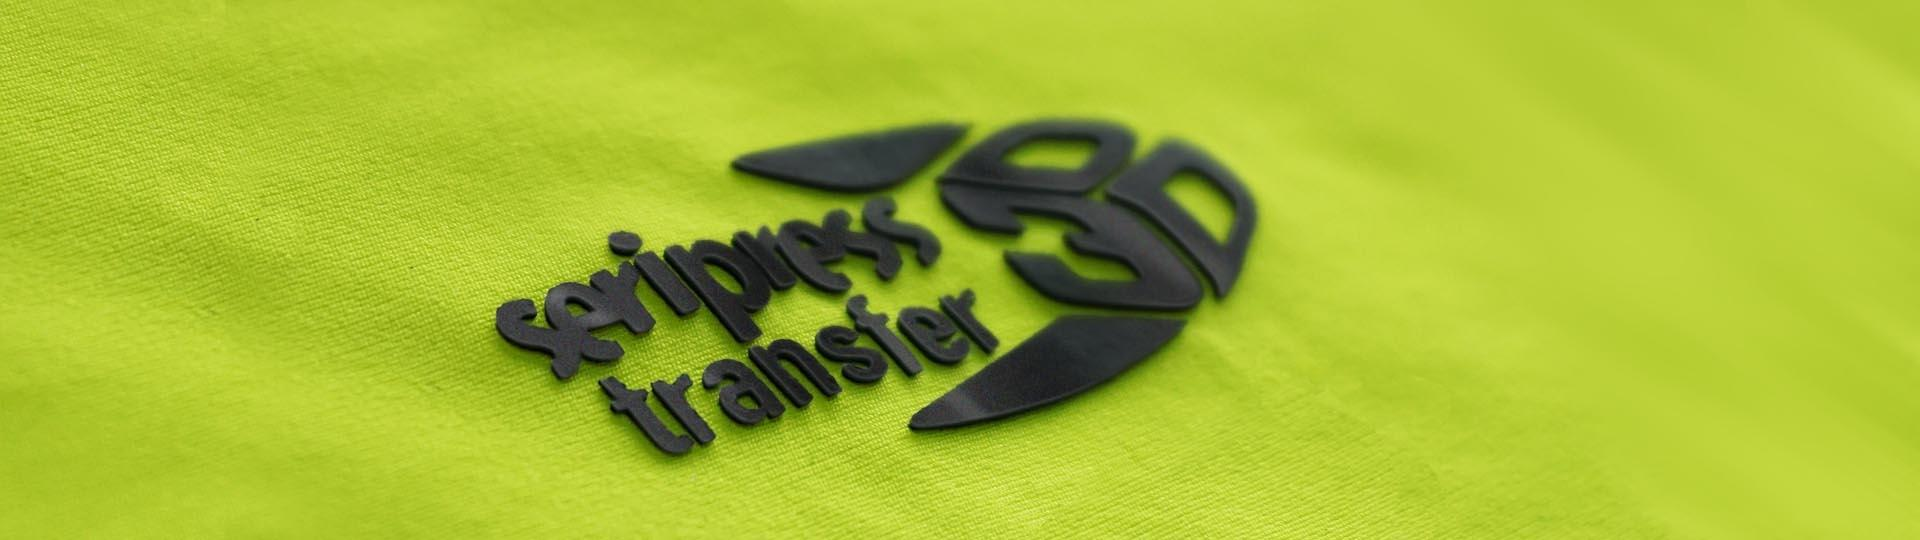 3D TRANSFER - image 6